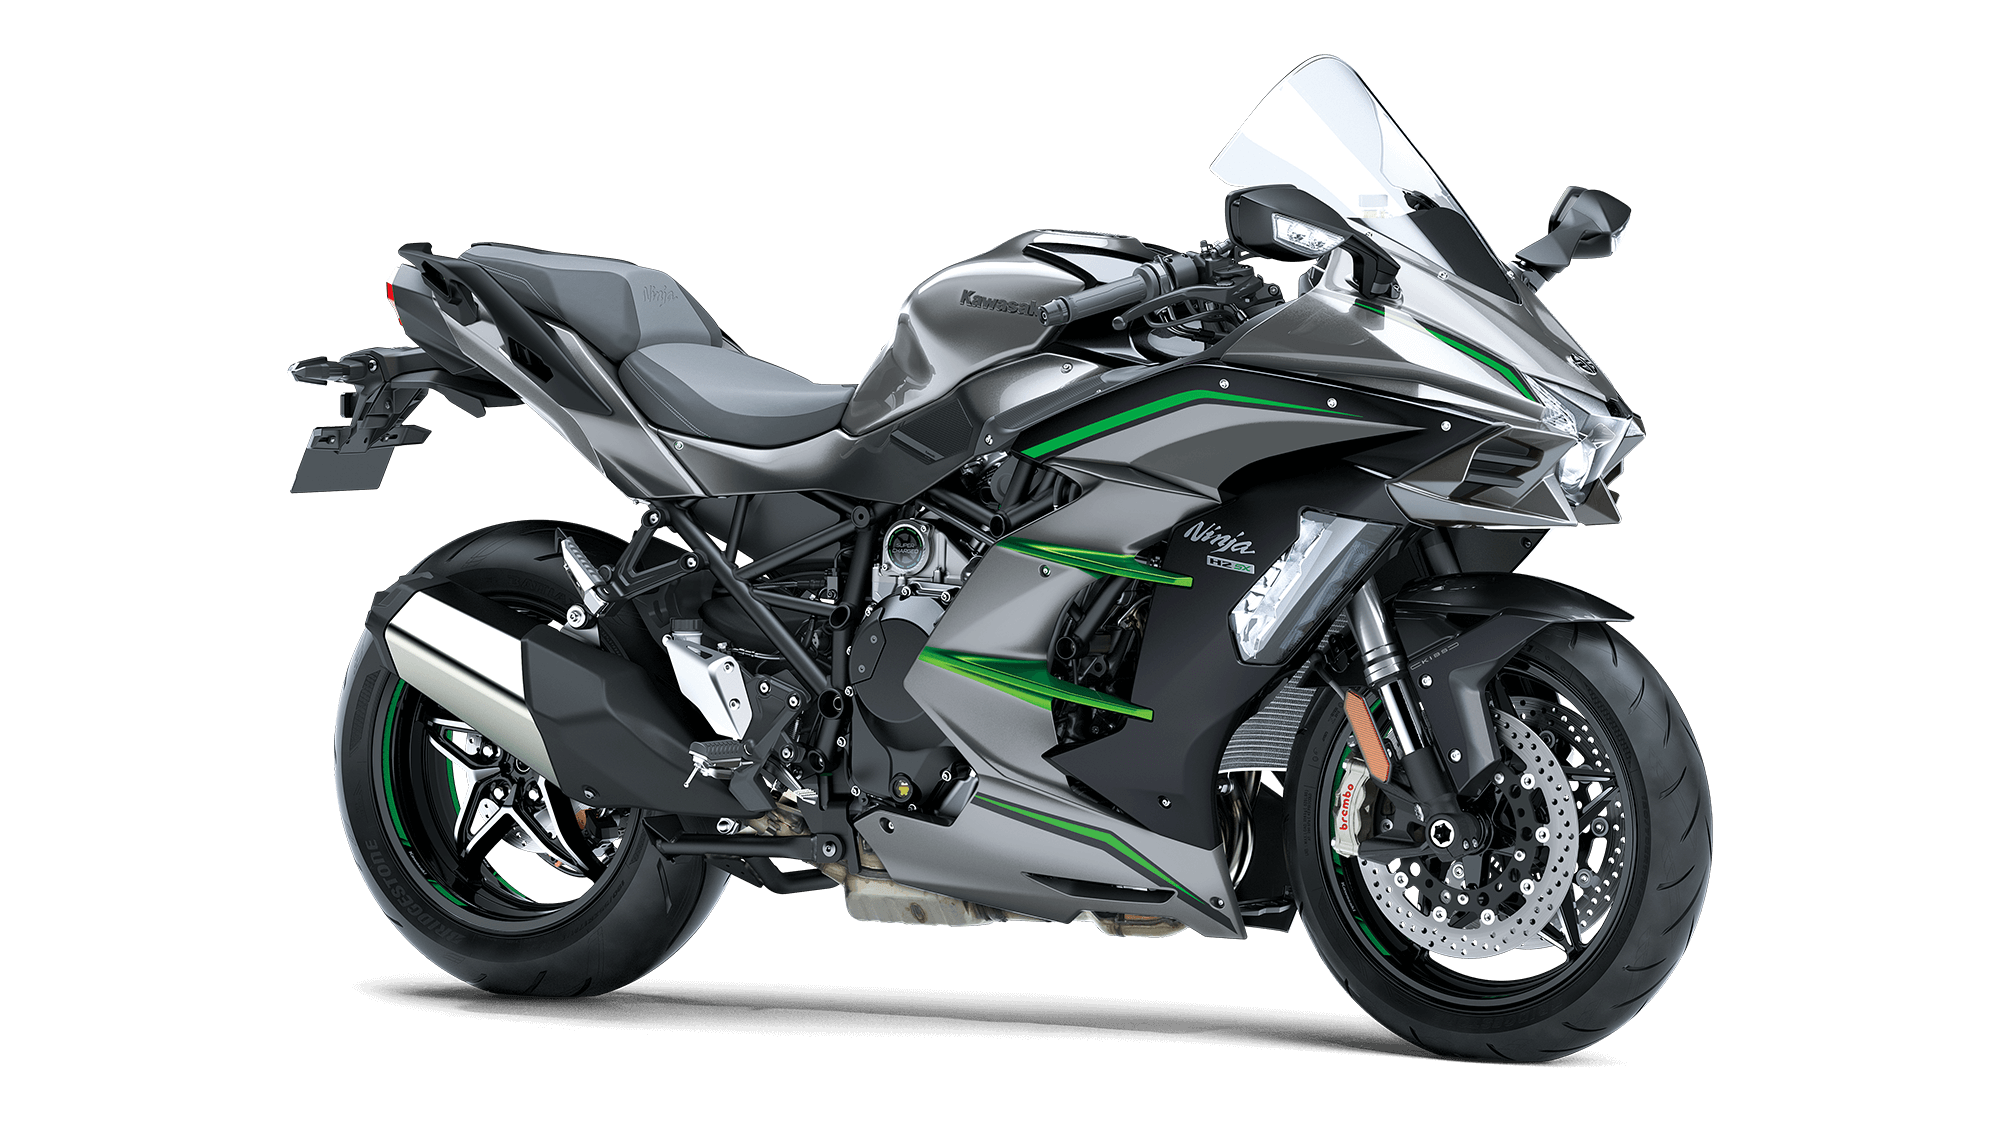 medium resolution of kawasaki motorcycles atv sxs jet ski personal watercraft kawasaki ninja kawasaki com diagrams